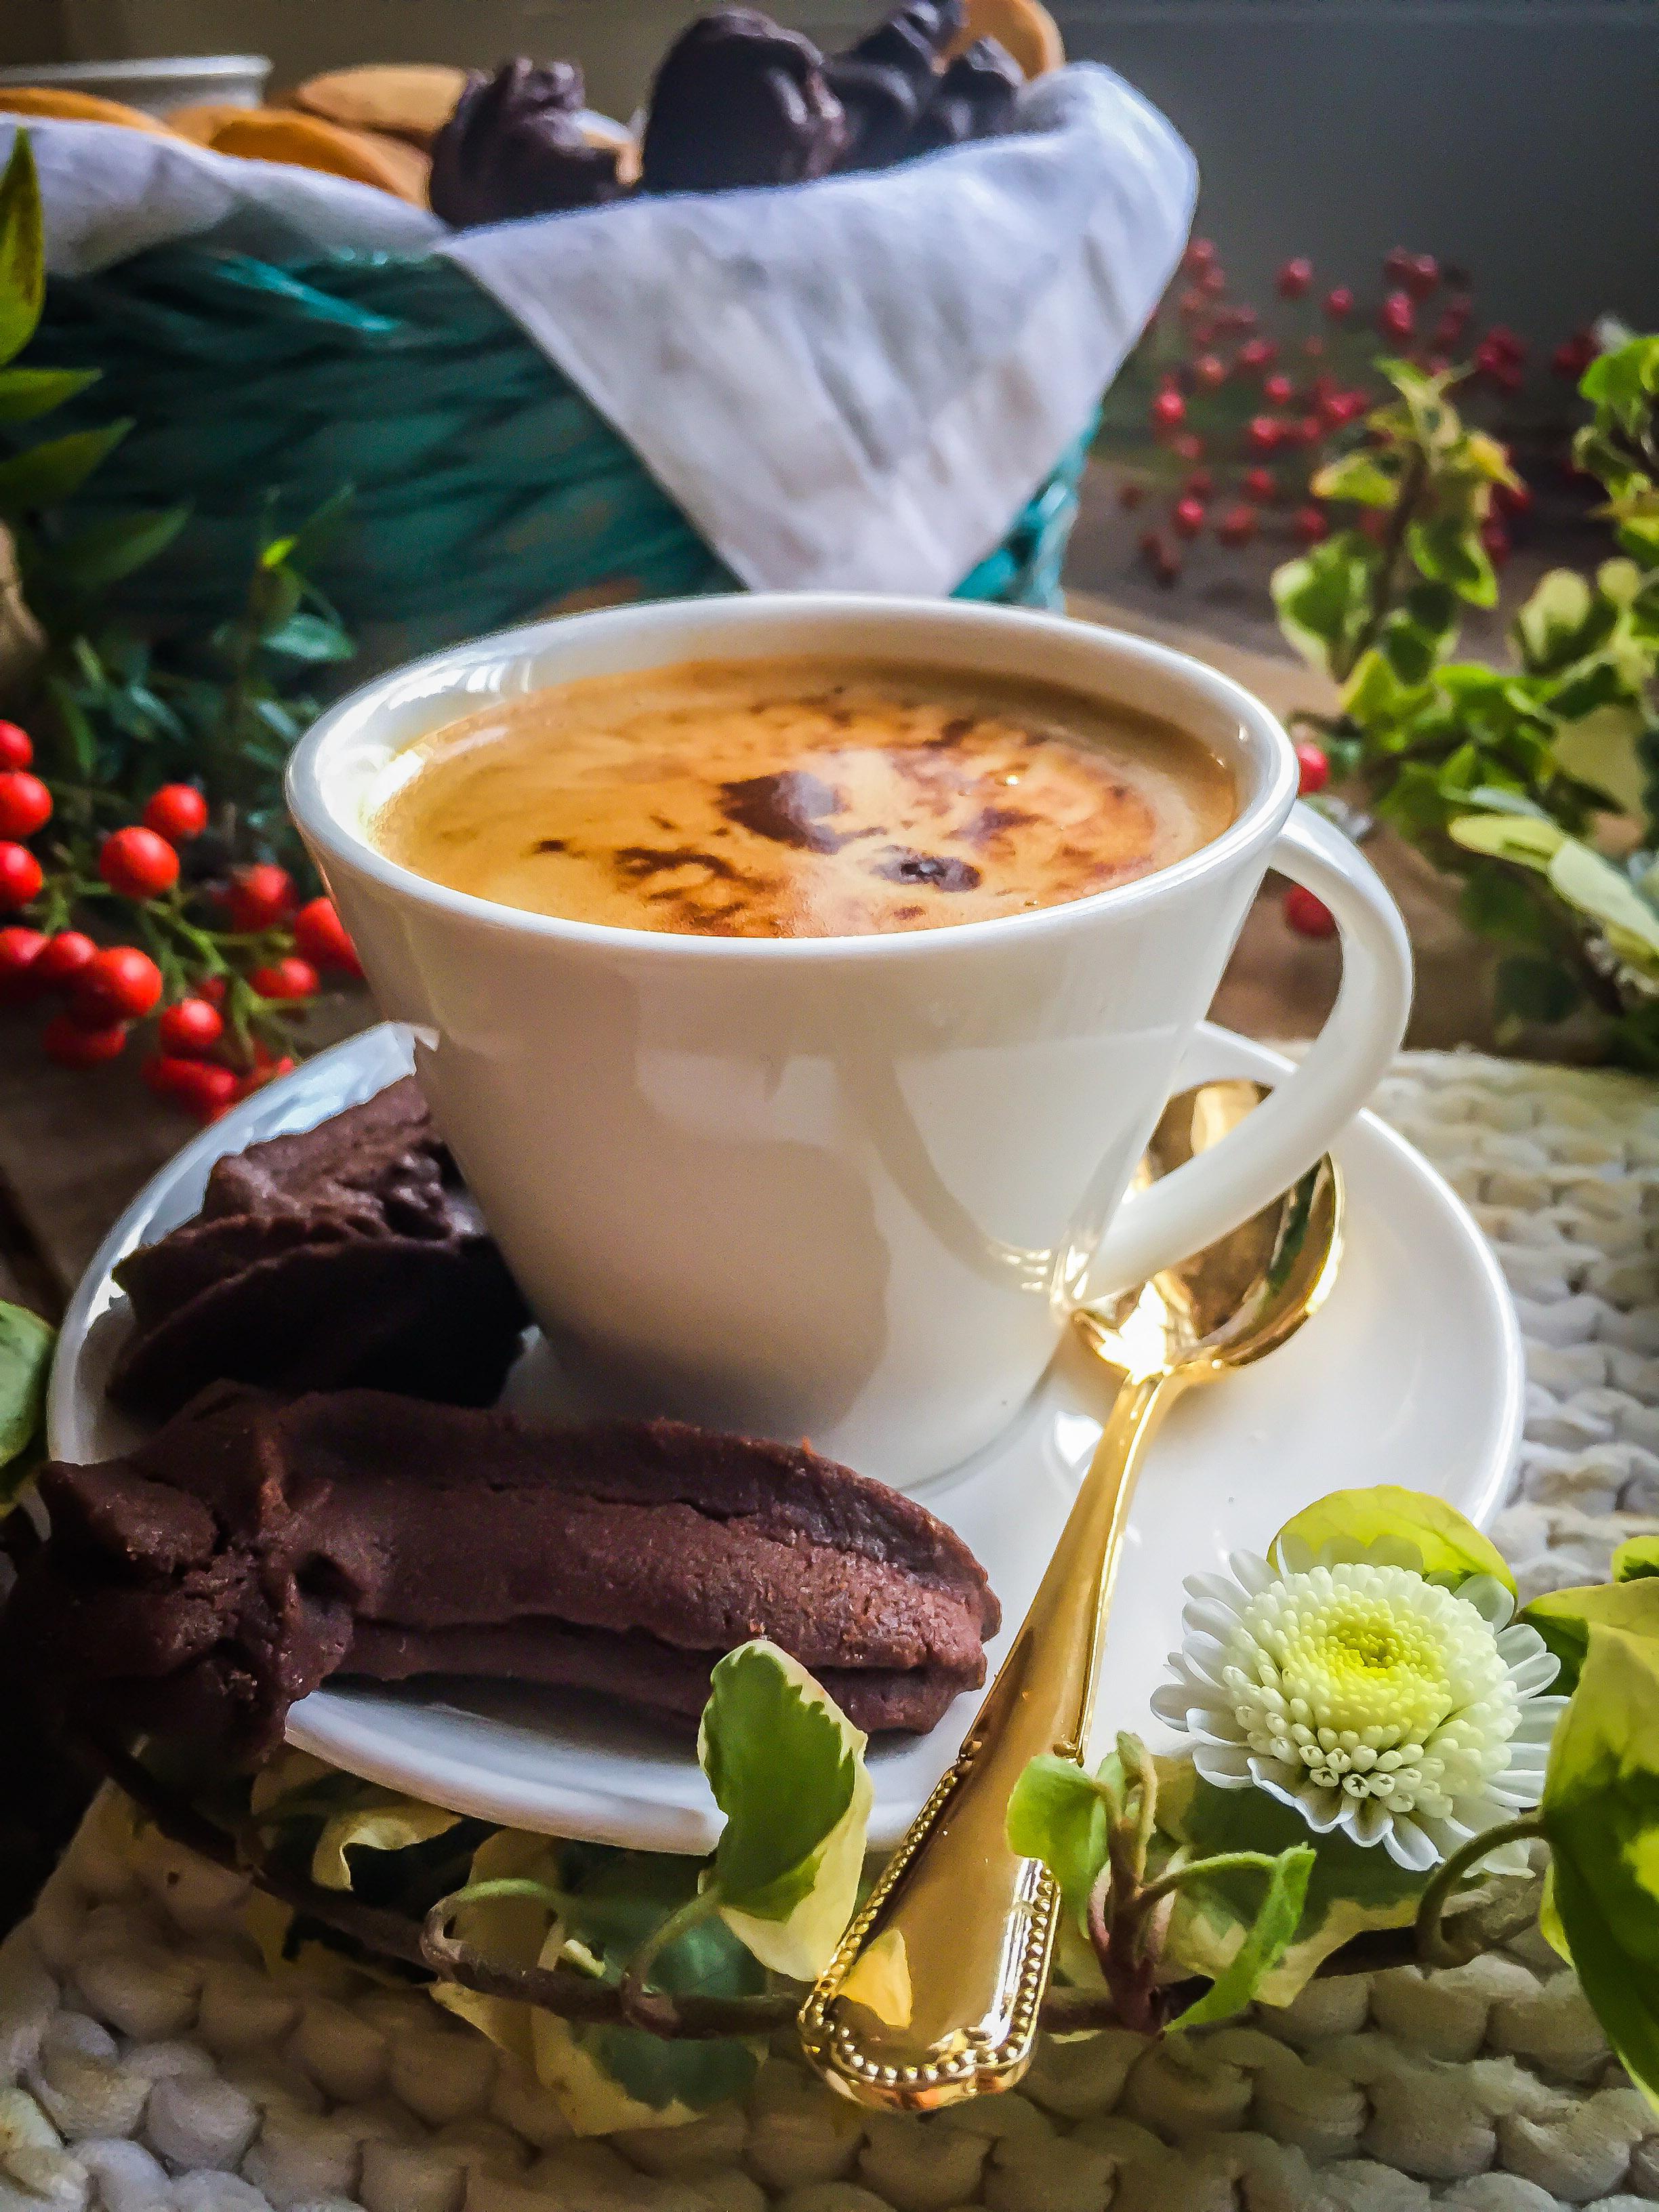 Biscotti da caffè: frollini al cacao e arancia